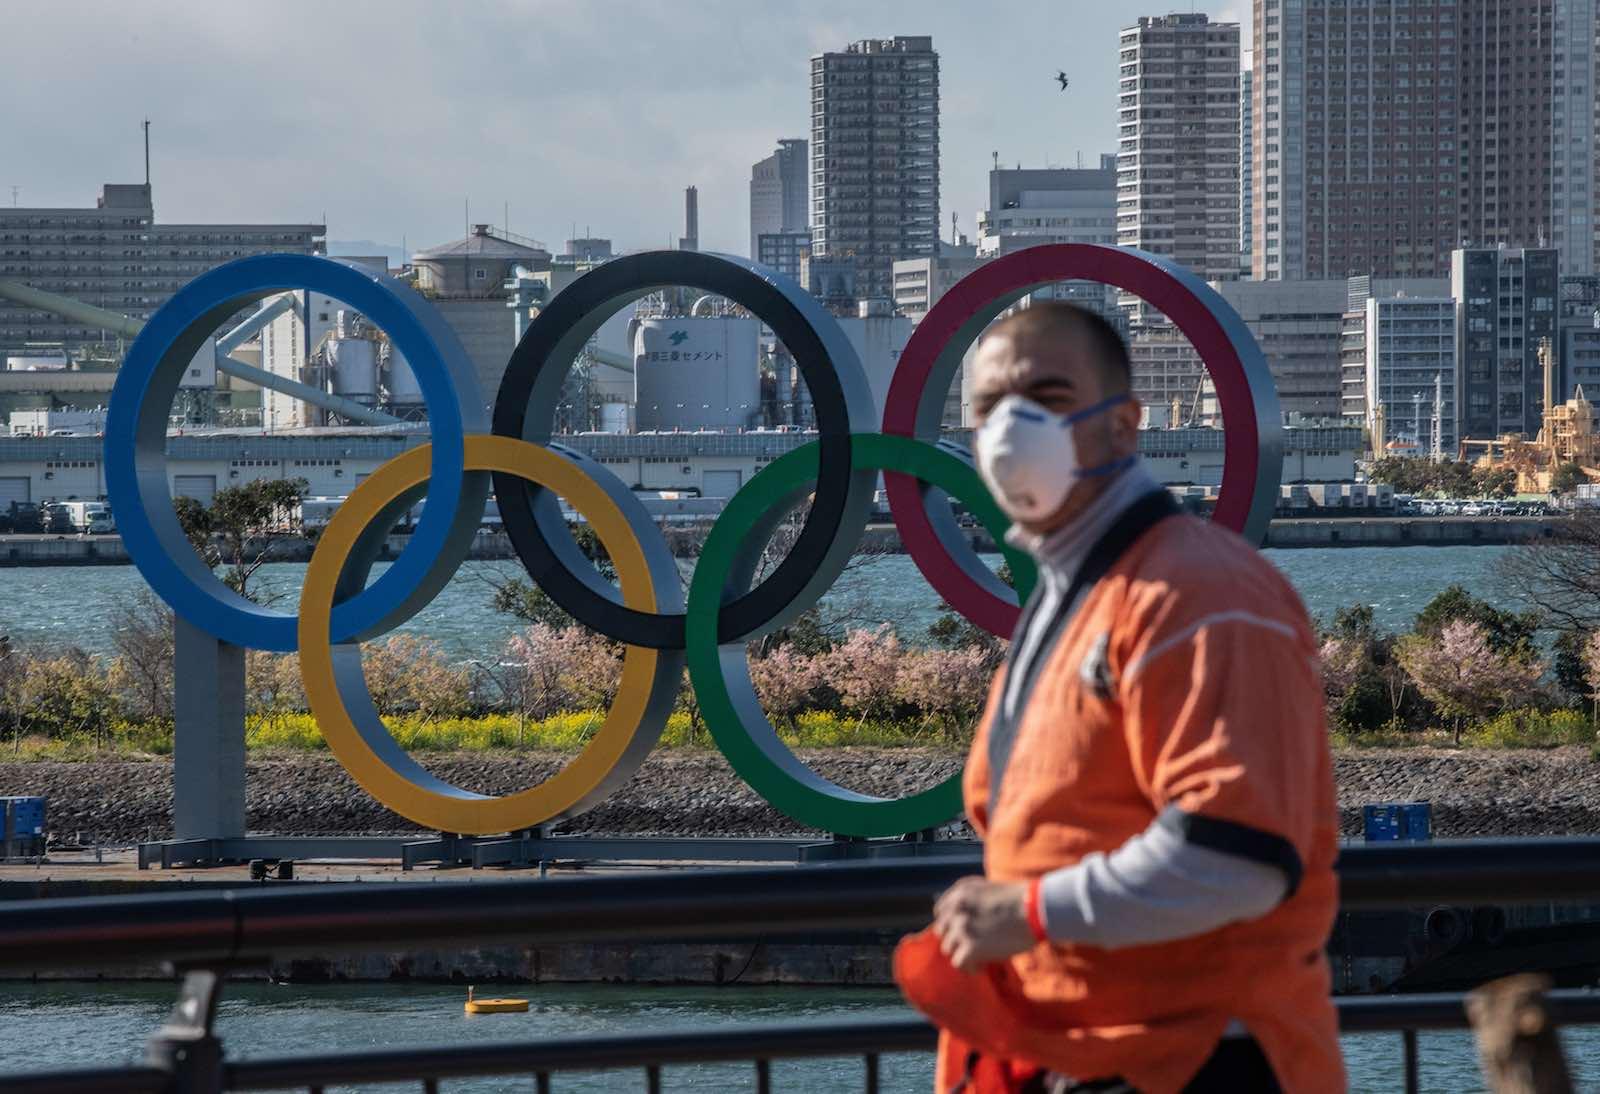 Suicidal Games: Tokyo's Coronavirus Olympics